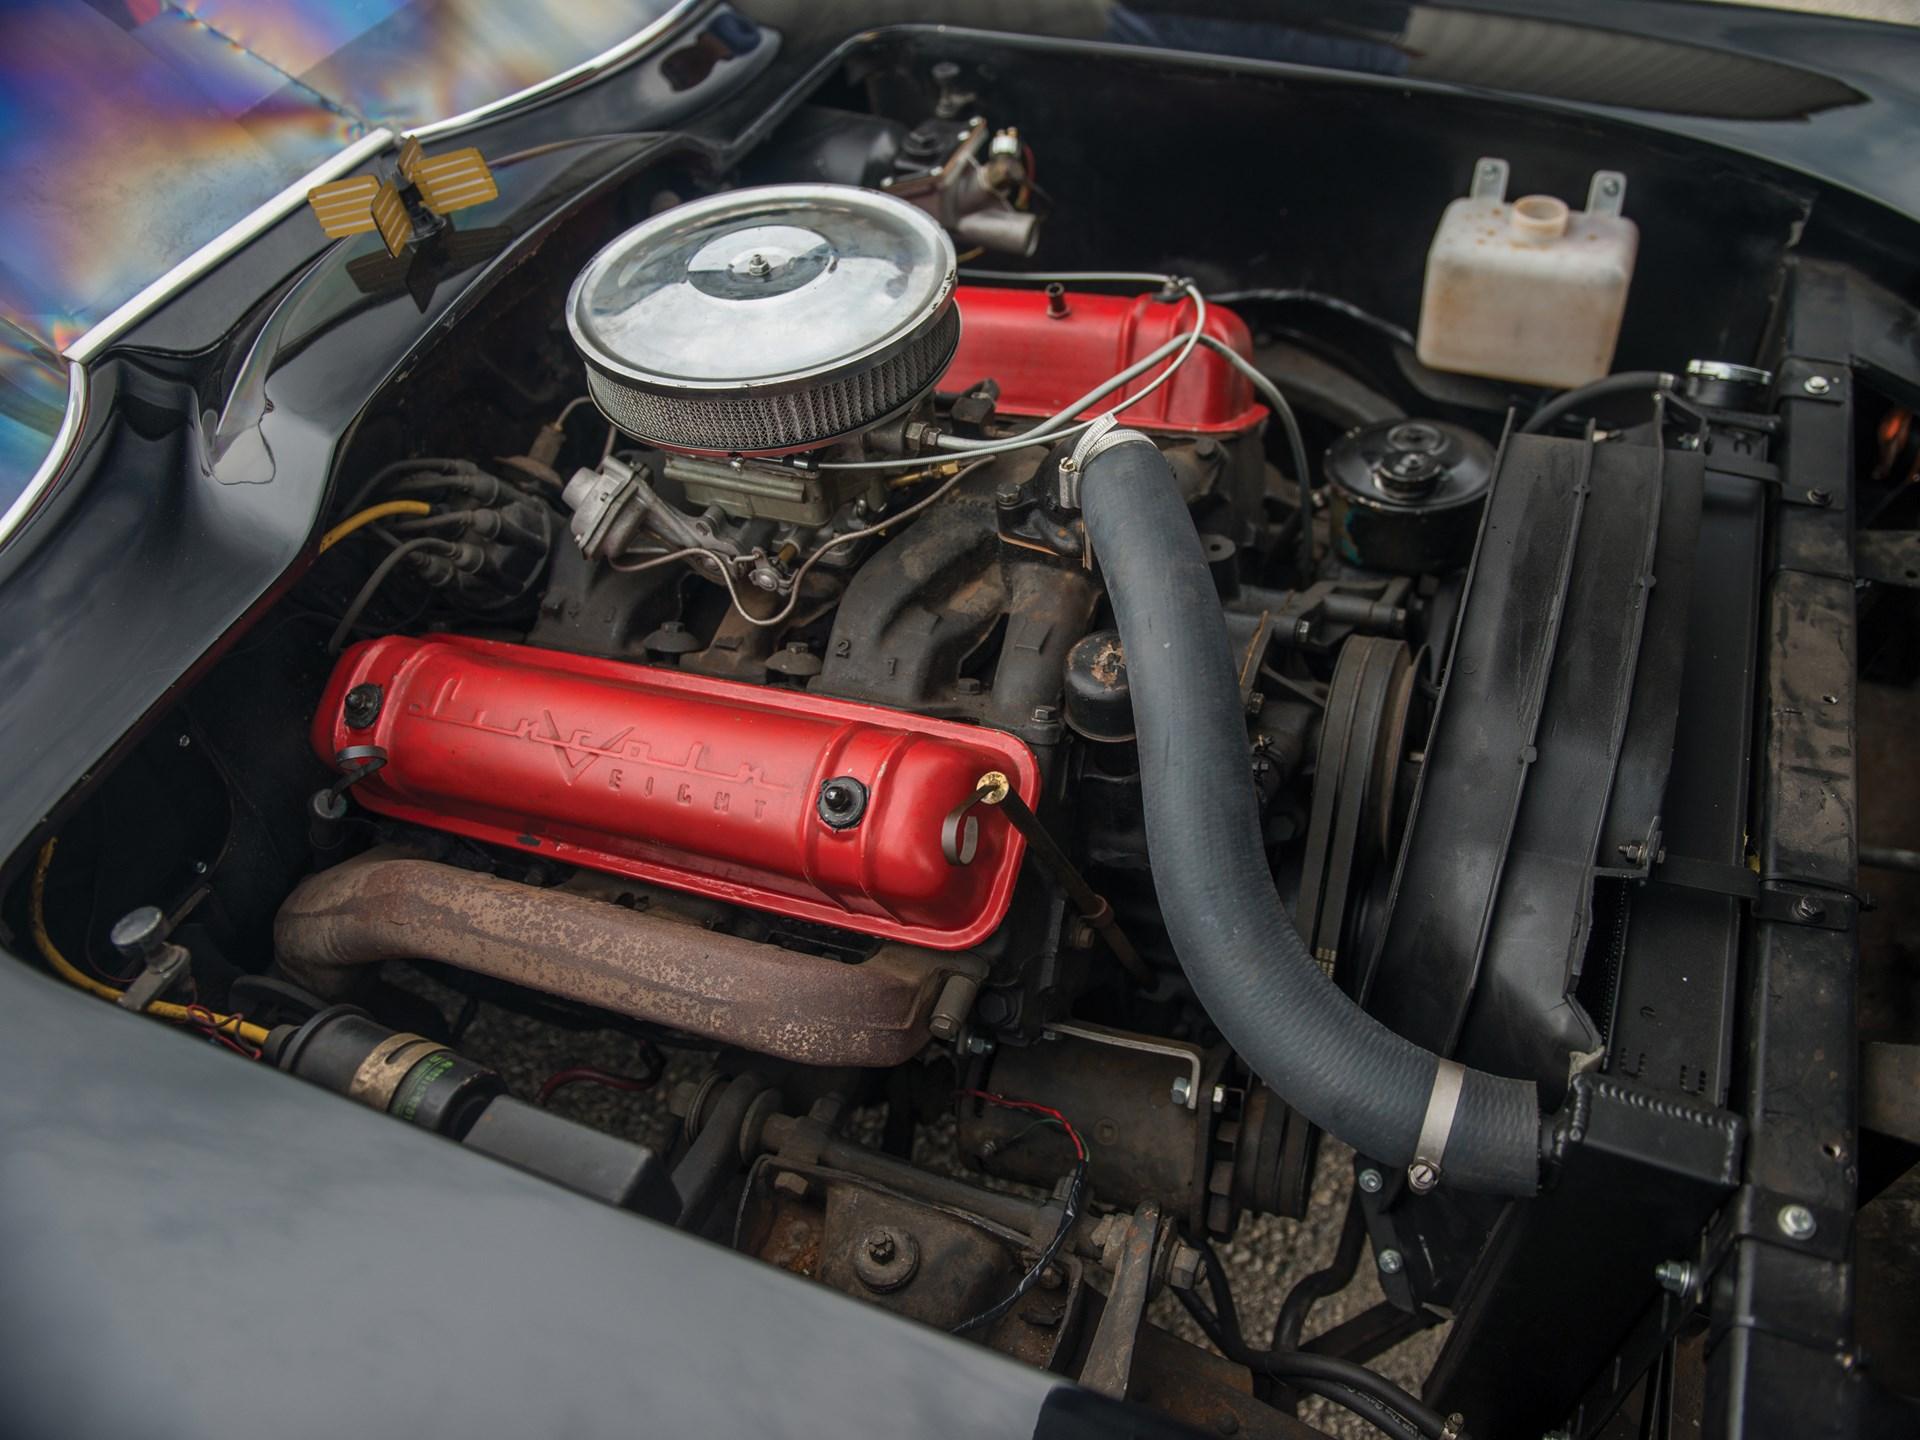 1966 Batmobile Recreation engine